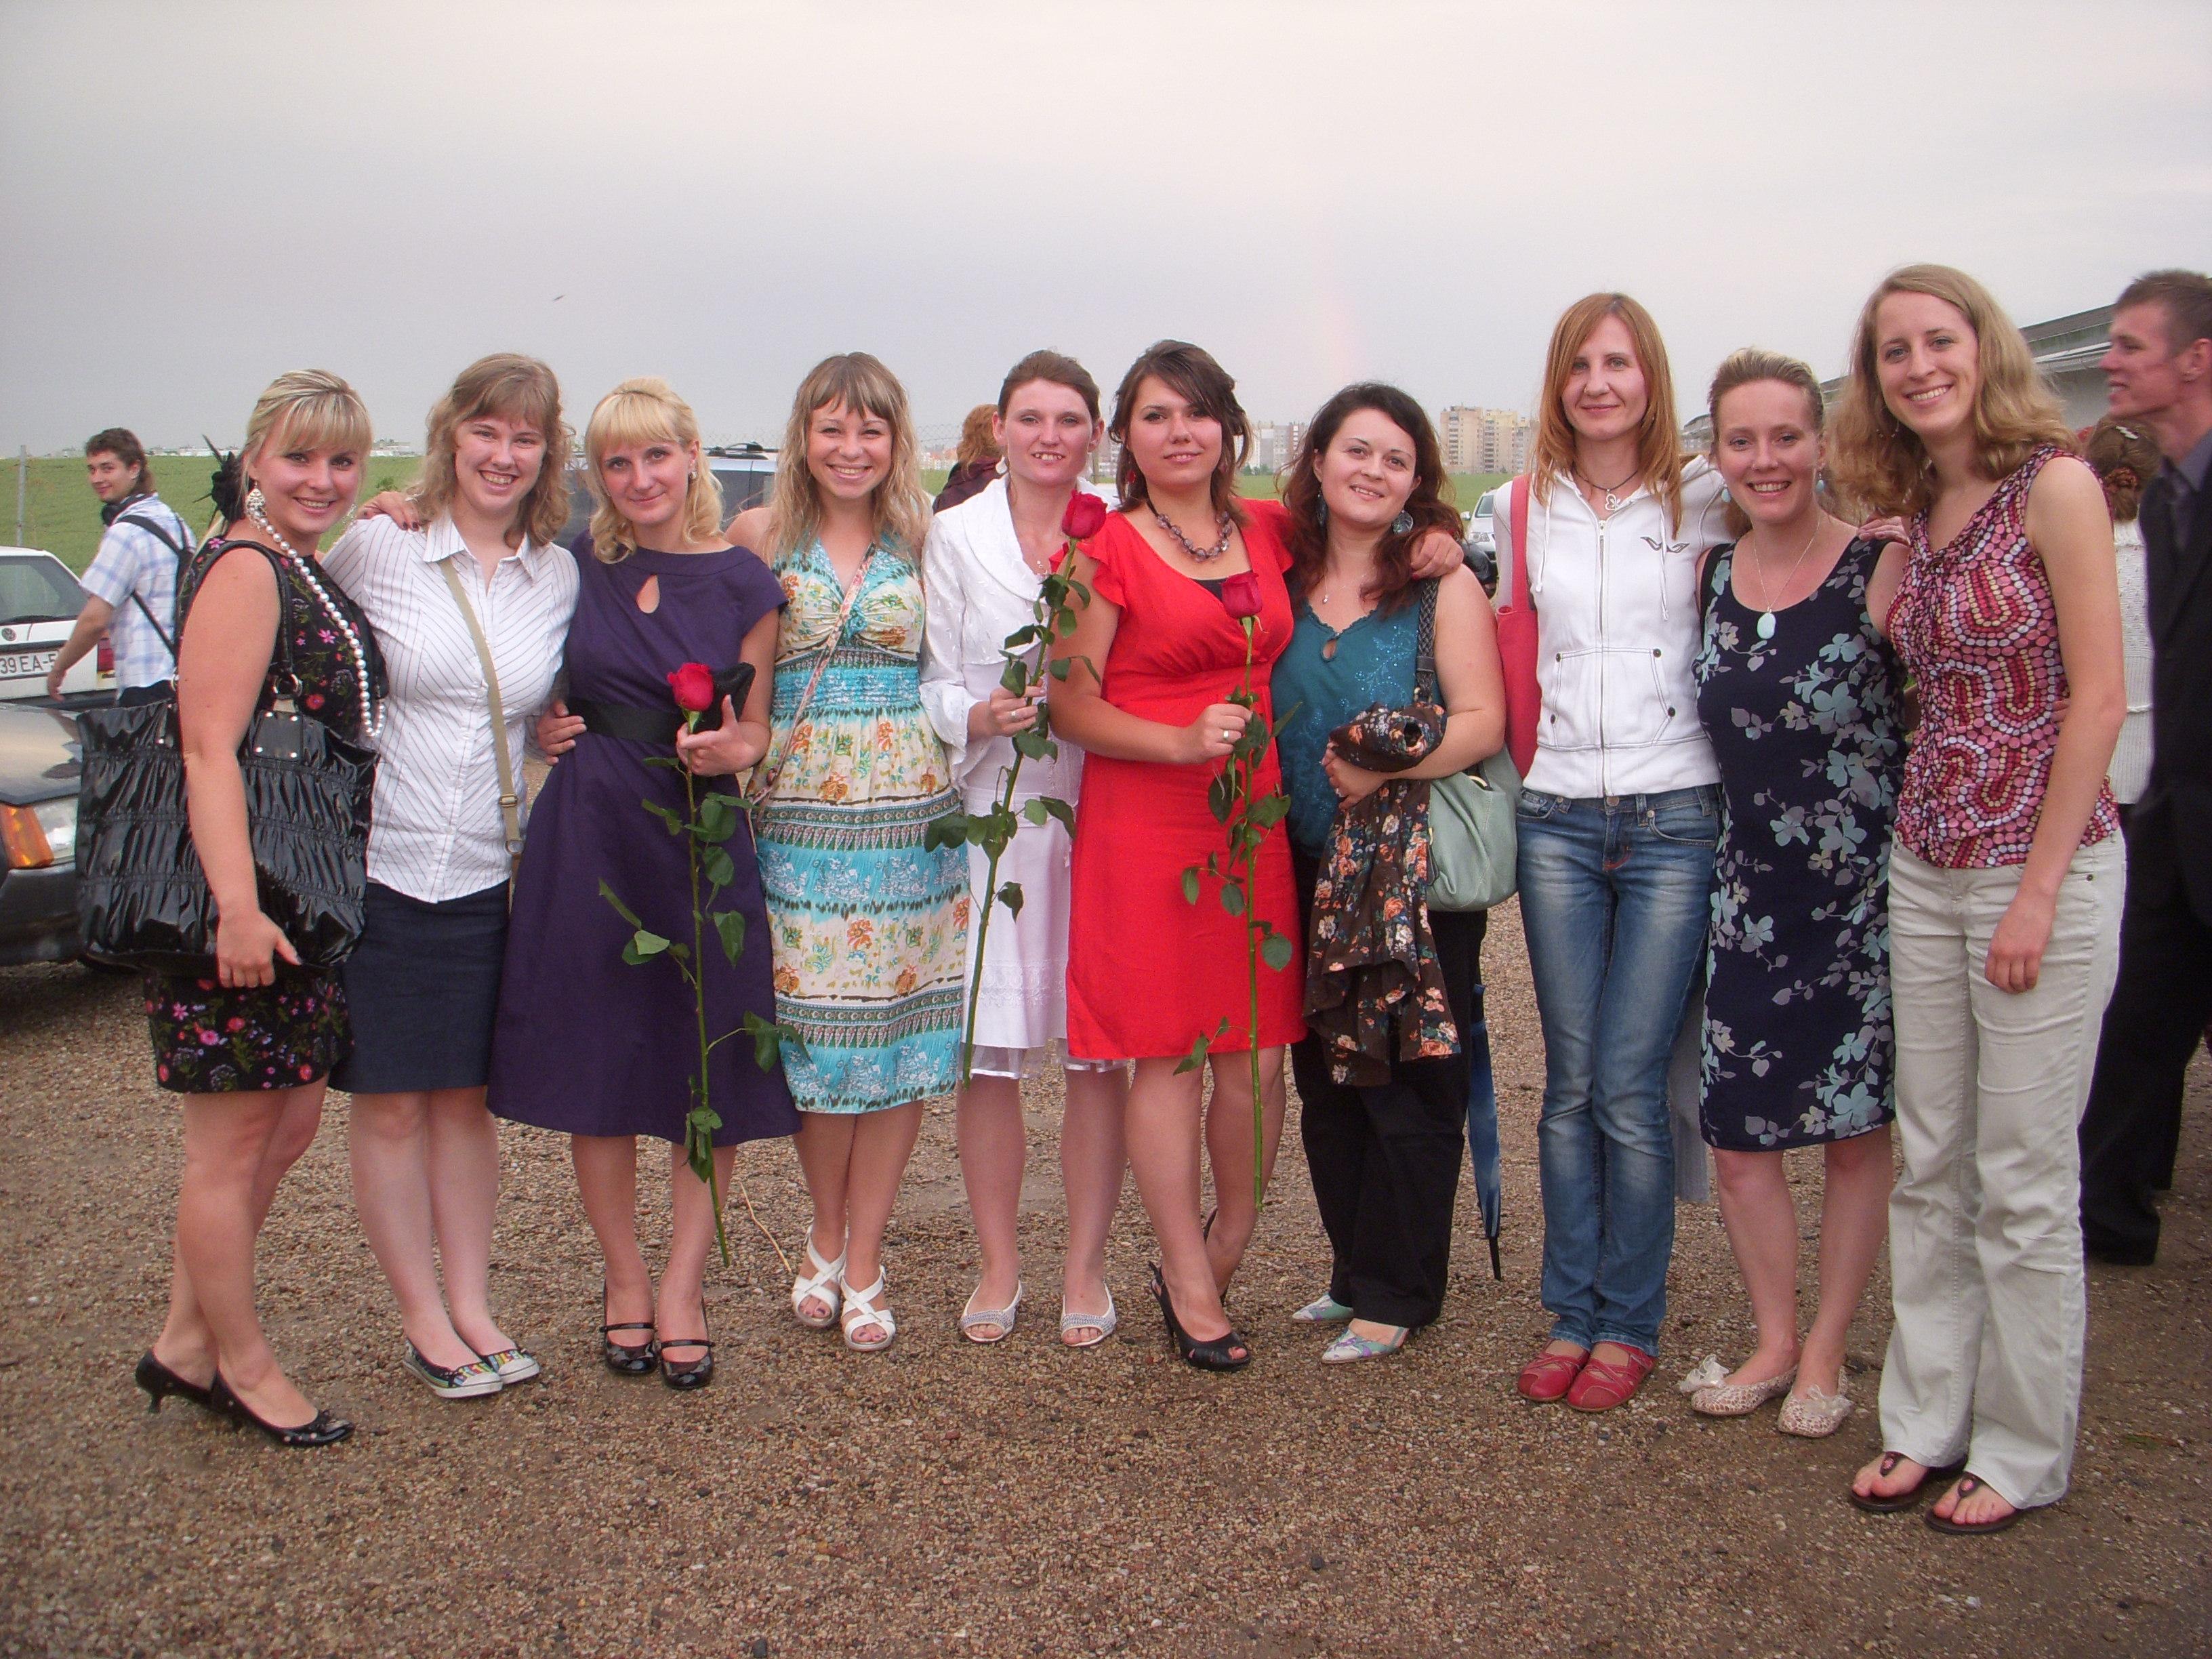 Life-Giving Ministry in Belarus   Stoneworks International